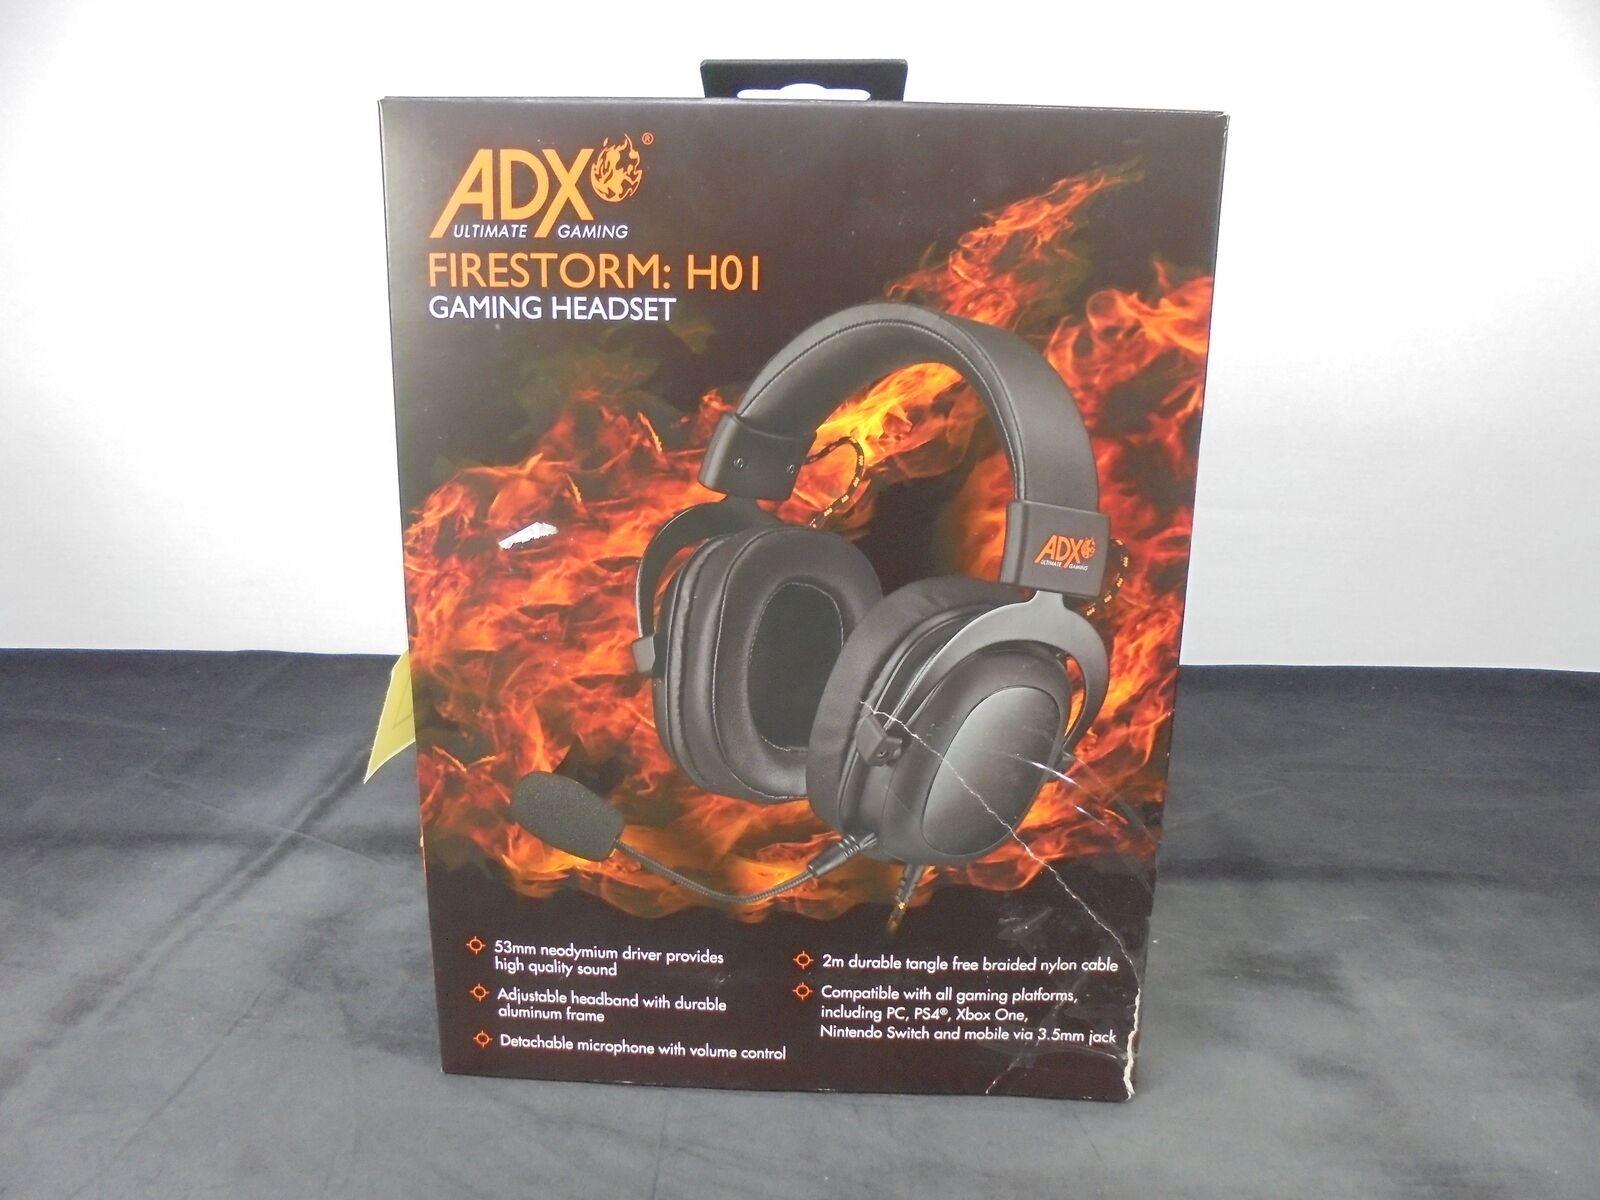 AFX Firestorm H01 Gaming Headset Review